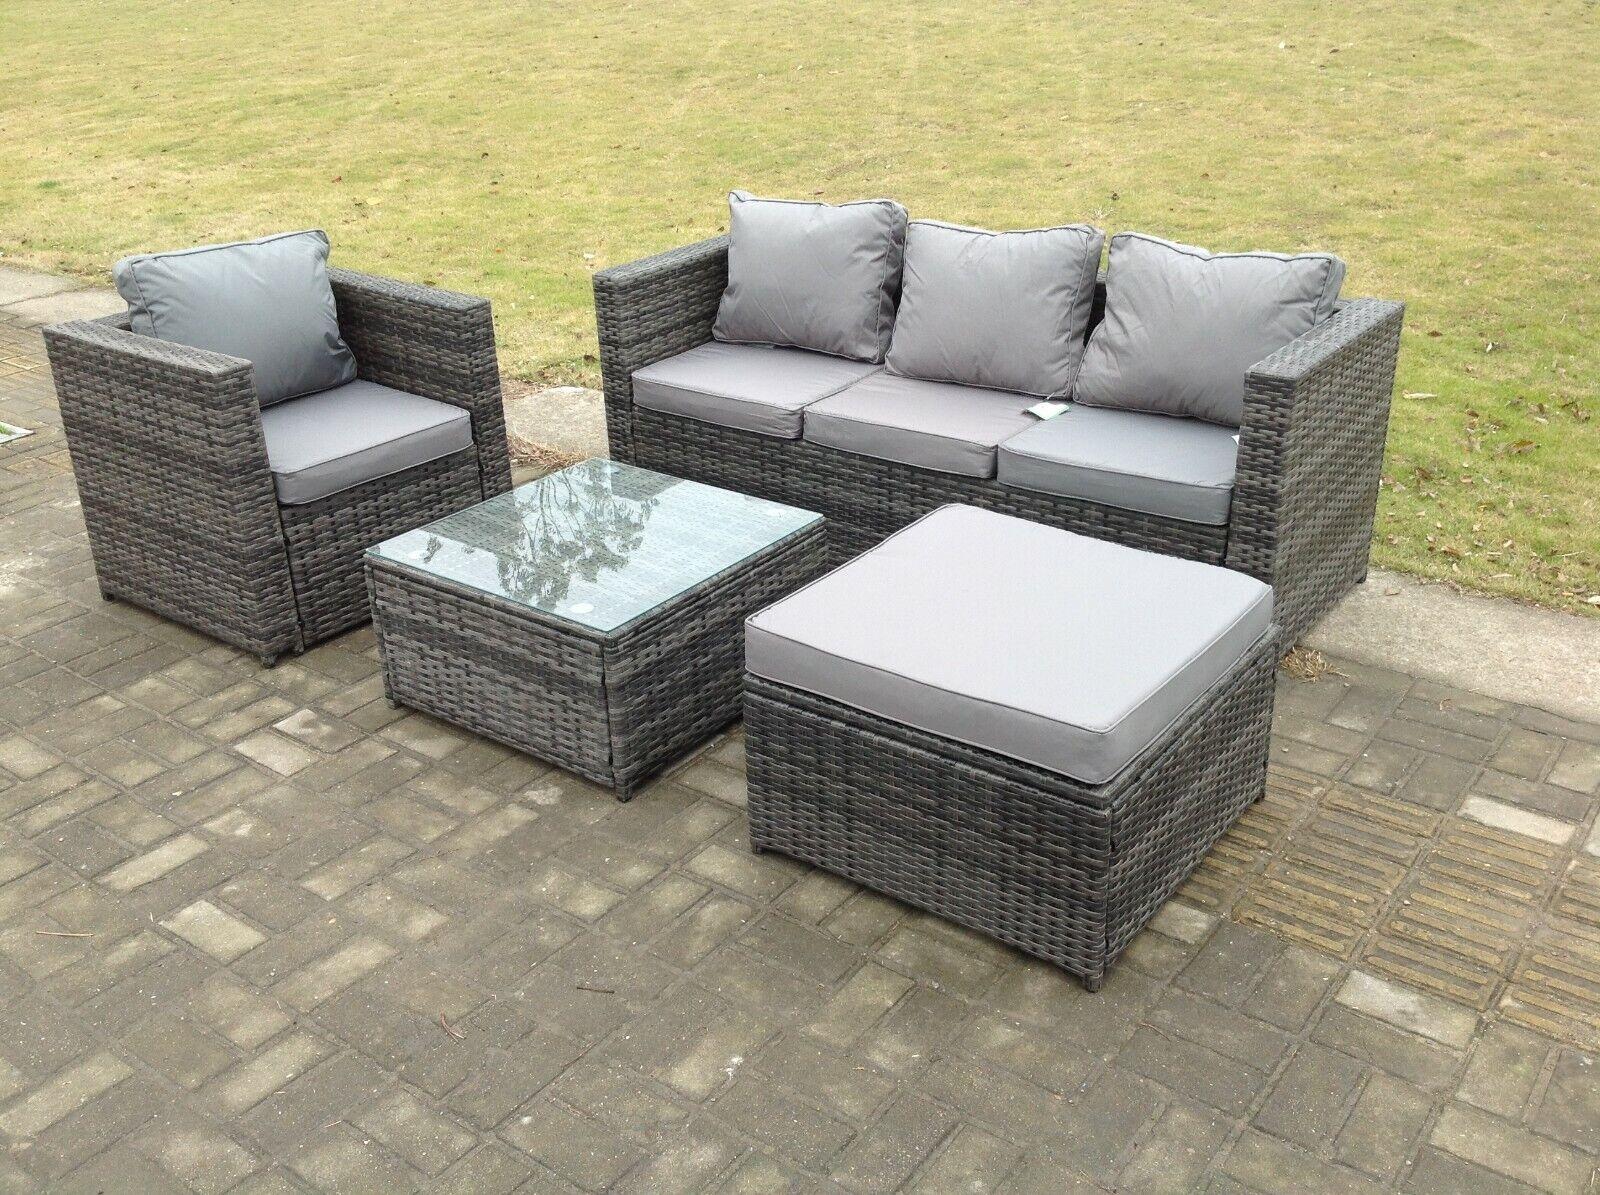 Garden Furniture - Lounge rattan sofa coffee table set outdoor garden furniture patio grey